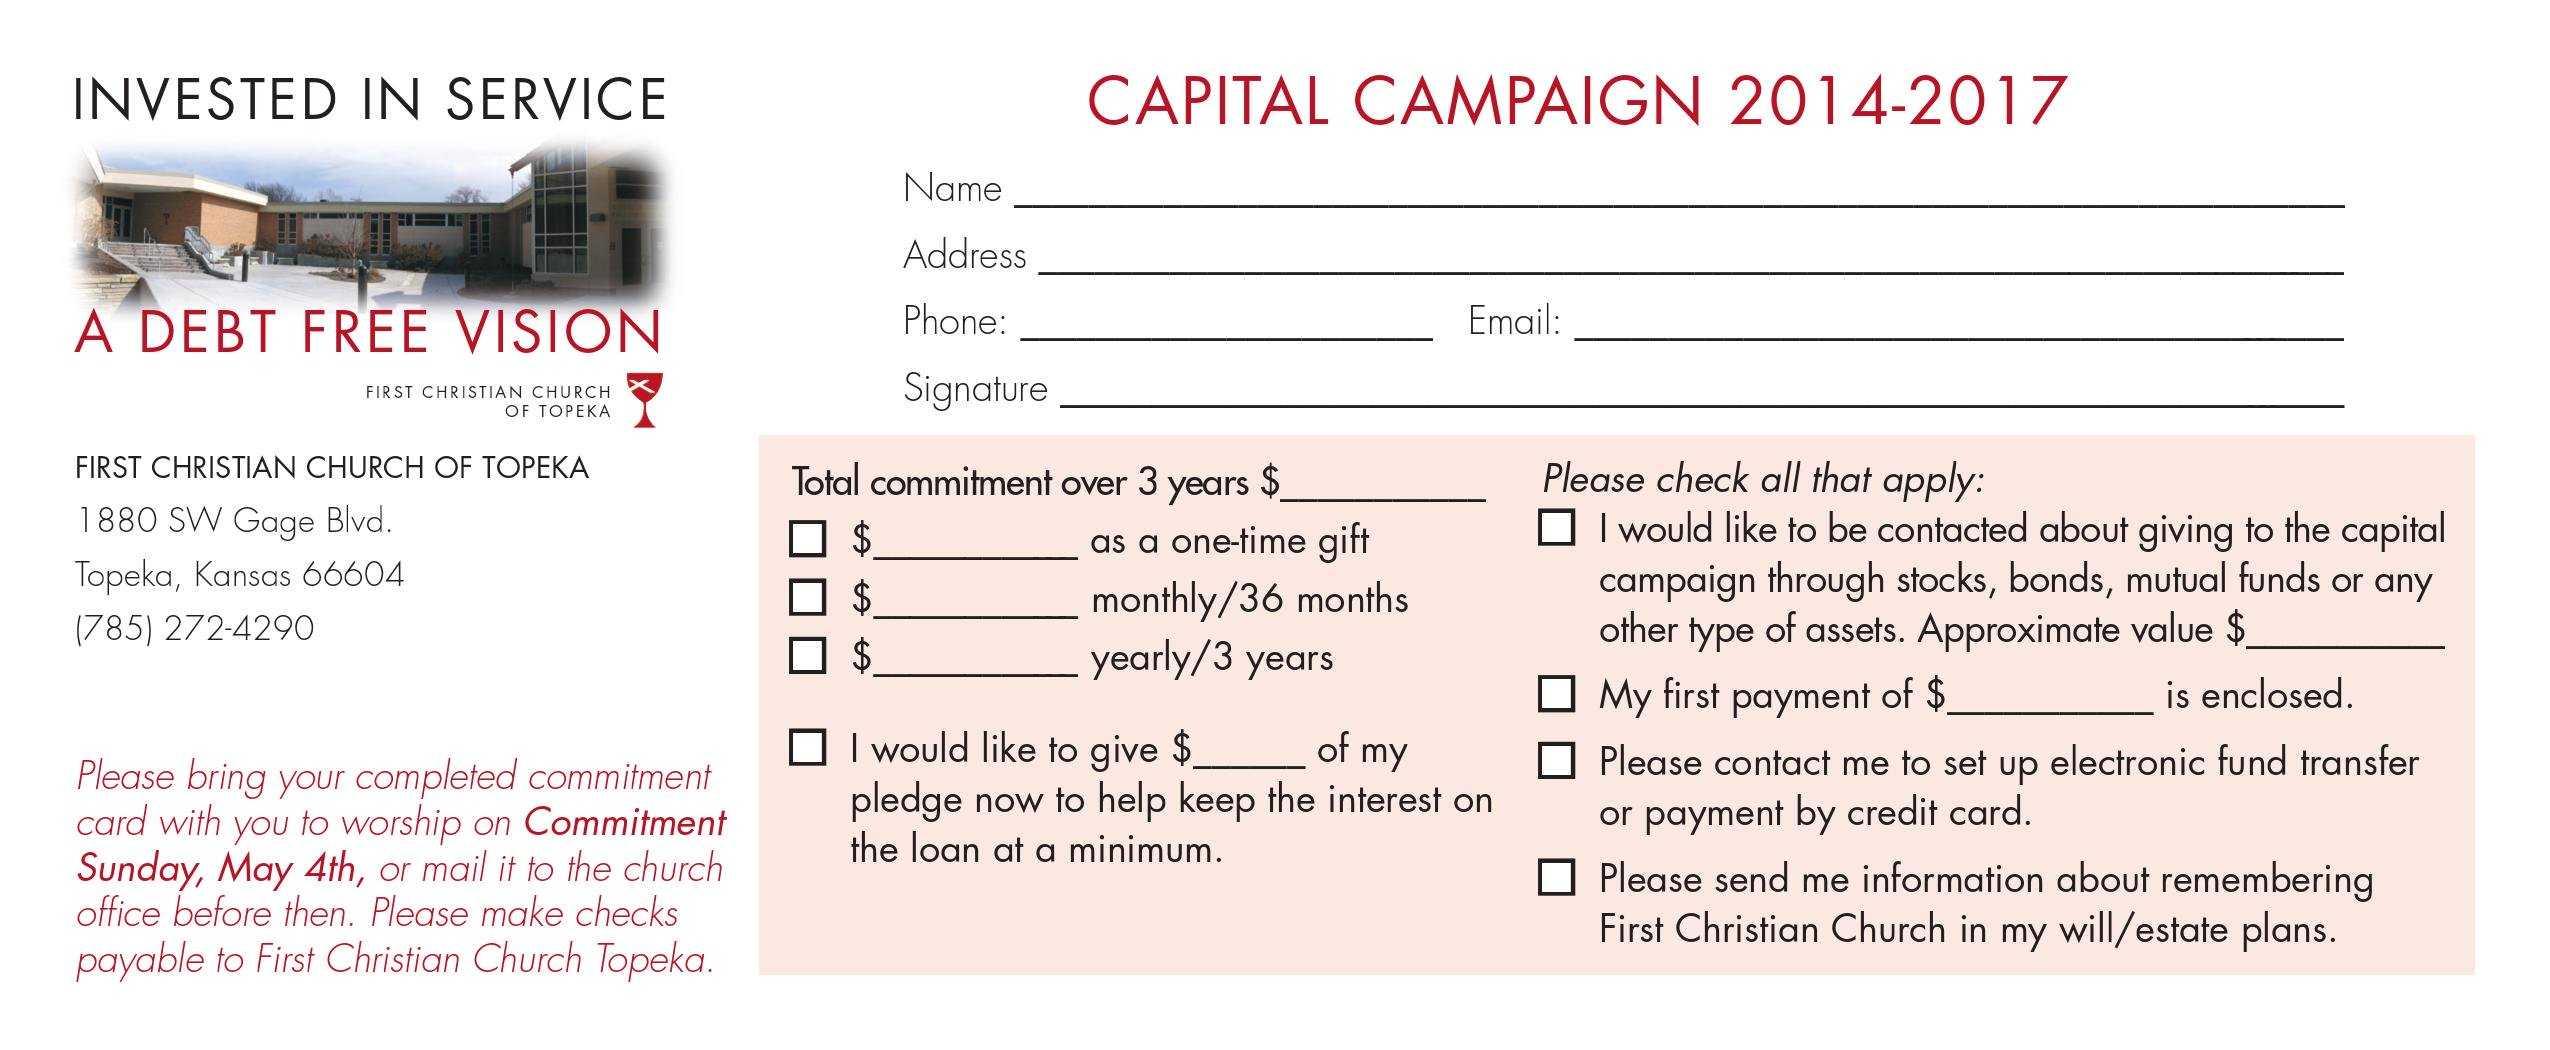 Church Capital Campaign Pledge Card Samples Within Church Pledge Card Template